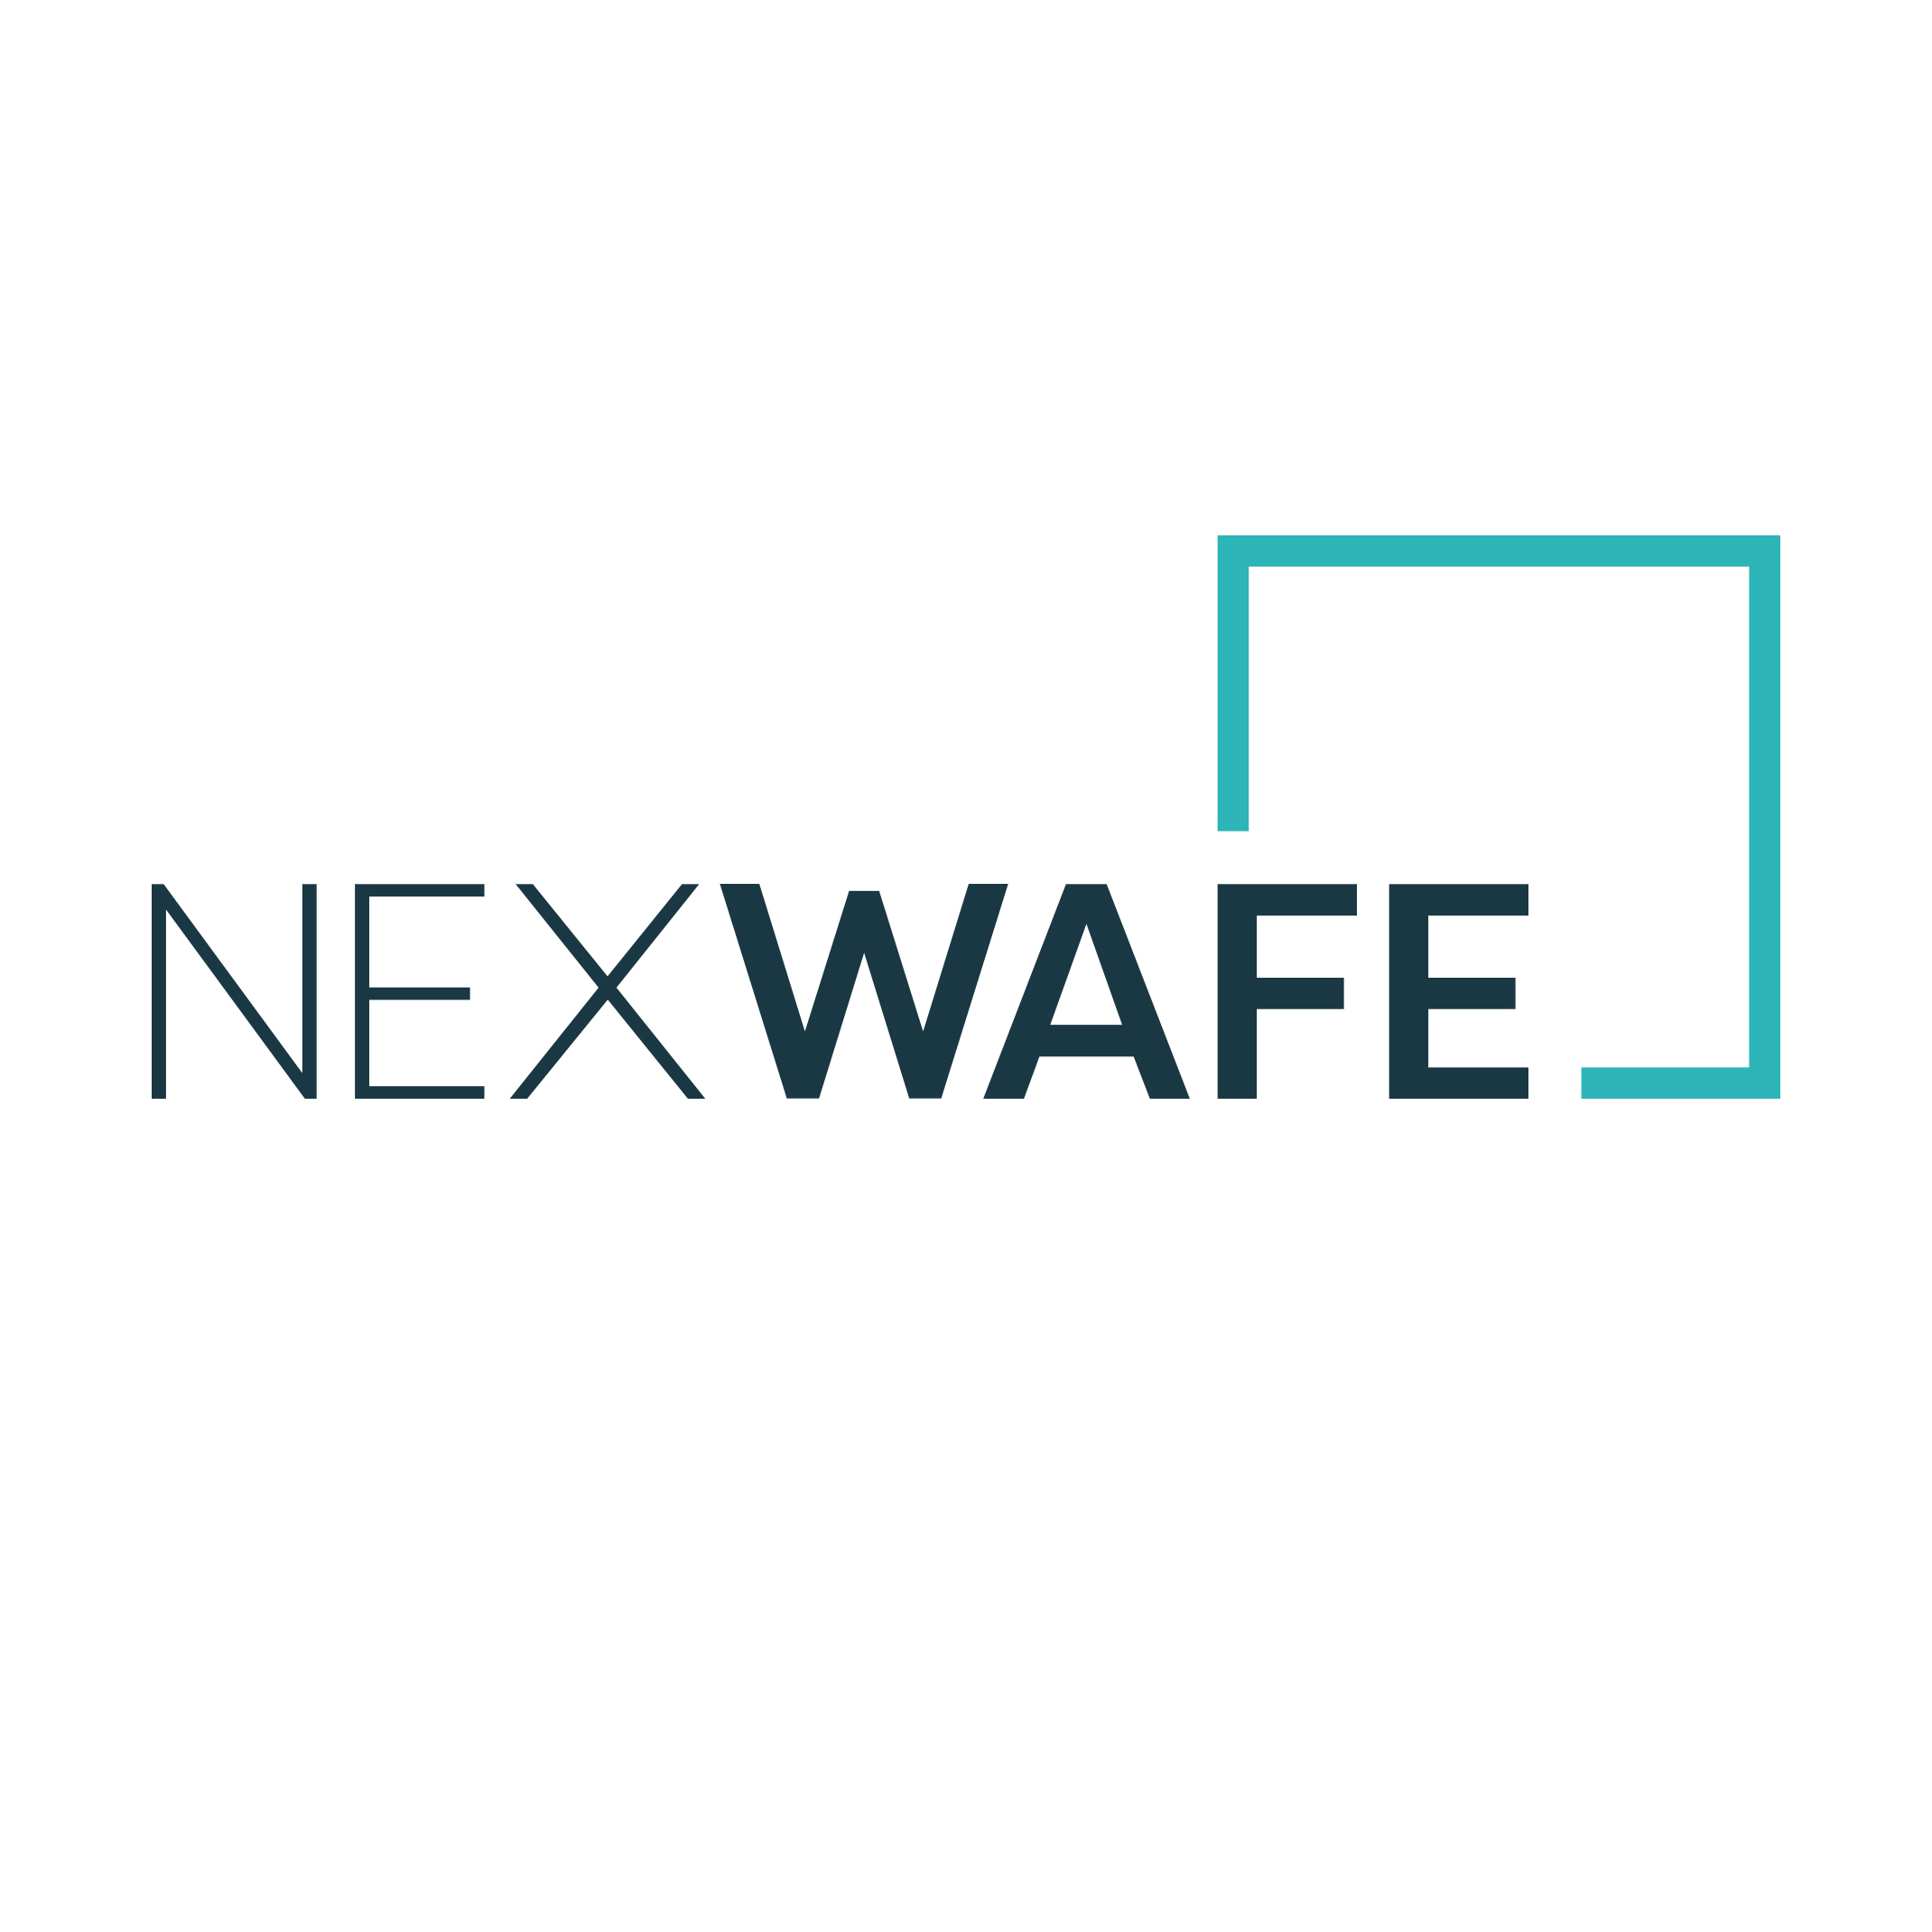 NexWafe